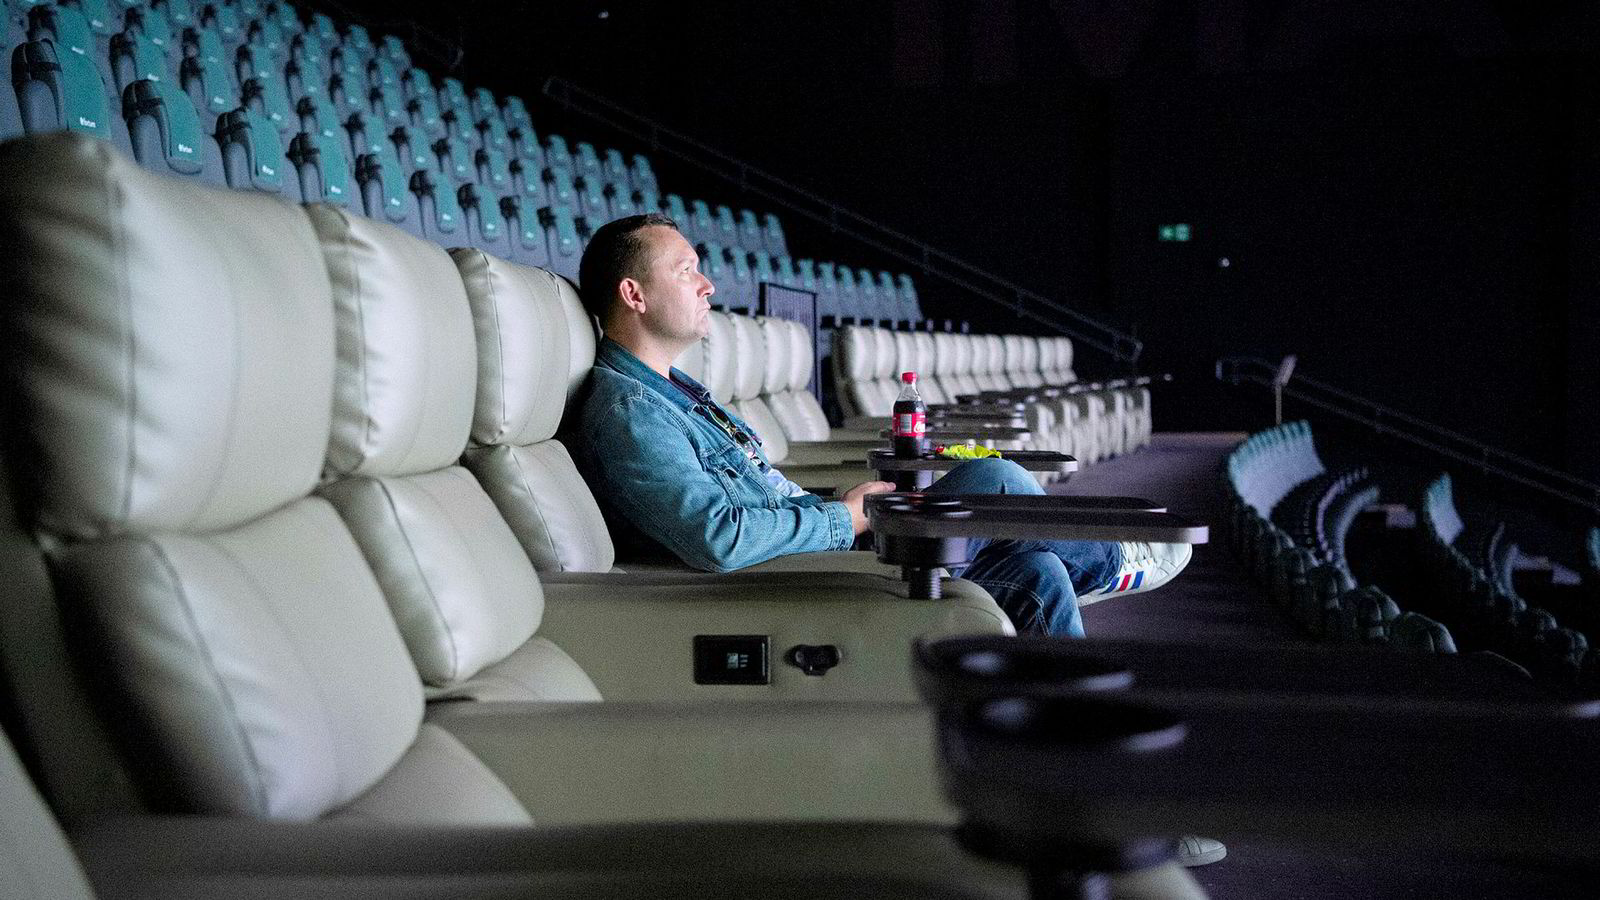 I Imax-salen på Odeon Storo i Oslo er det egne VIP-seter med bedre benplass, varme i sete og uttak til mobilader. Johan Lundberg skulle se Tarantino-filmen «Once Upon a Time … in Hollywood» tirsdag.